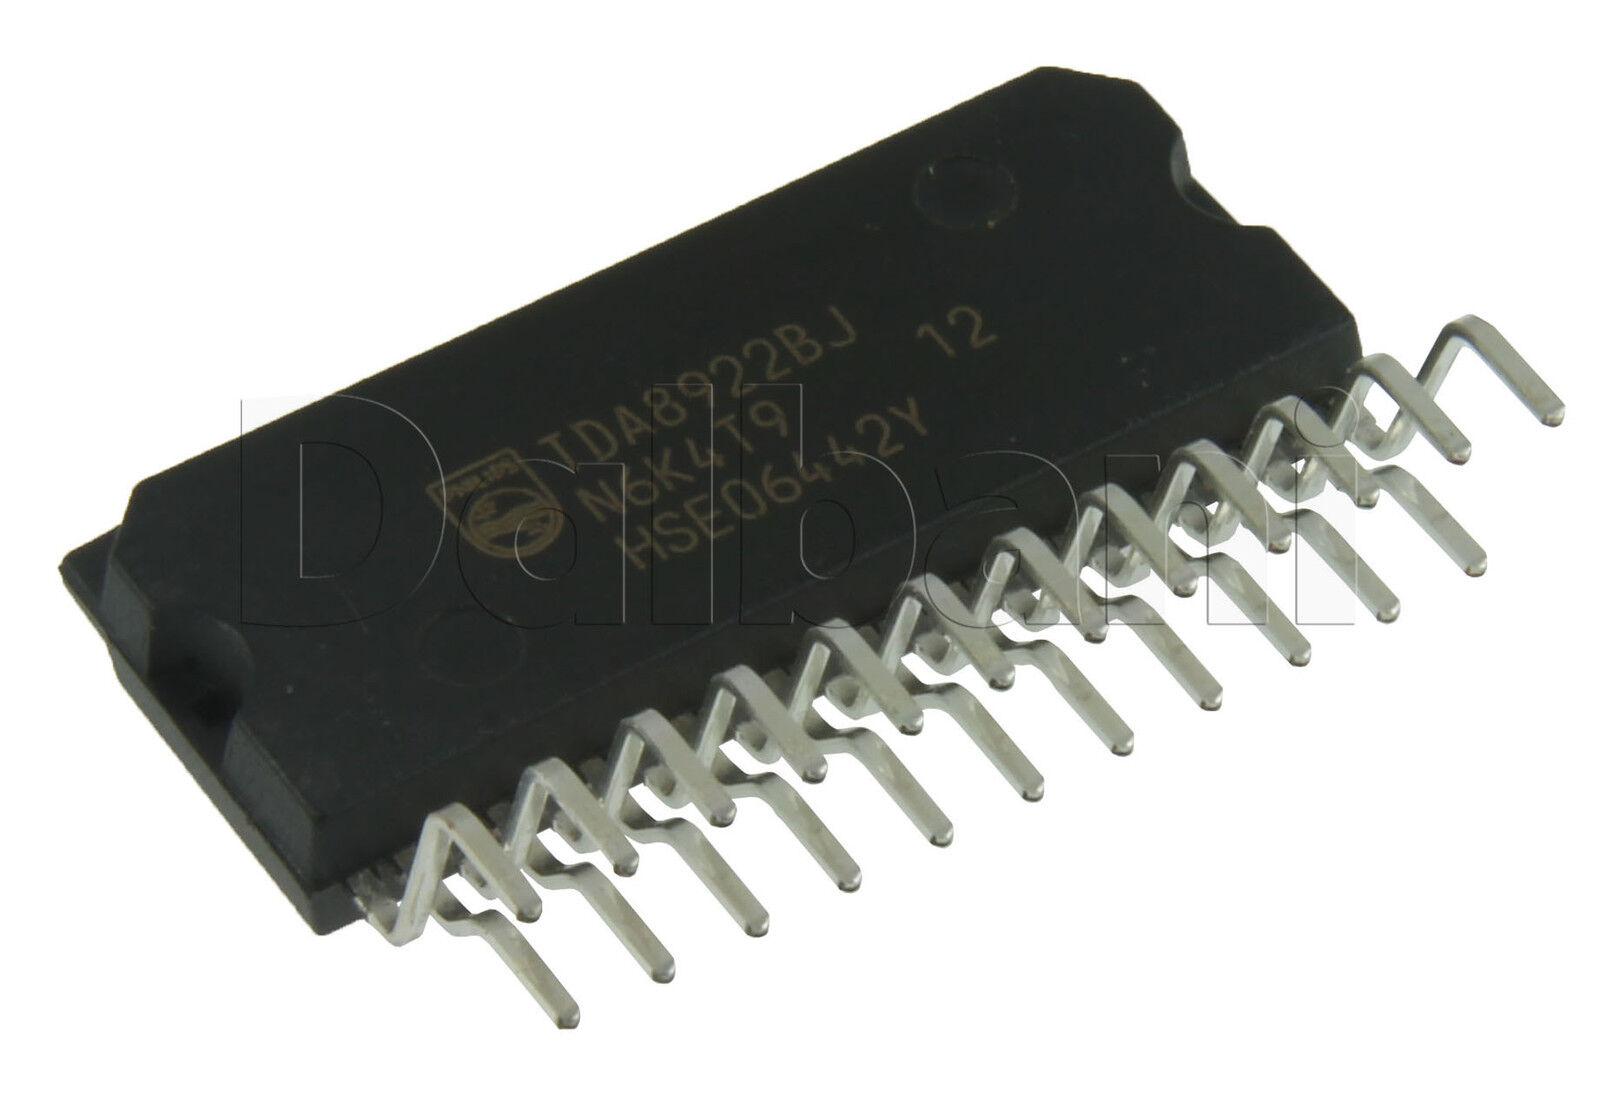 TDA8922BTH Original NXP Integrated Circuit Tda-8922bth for sale online